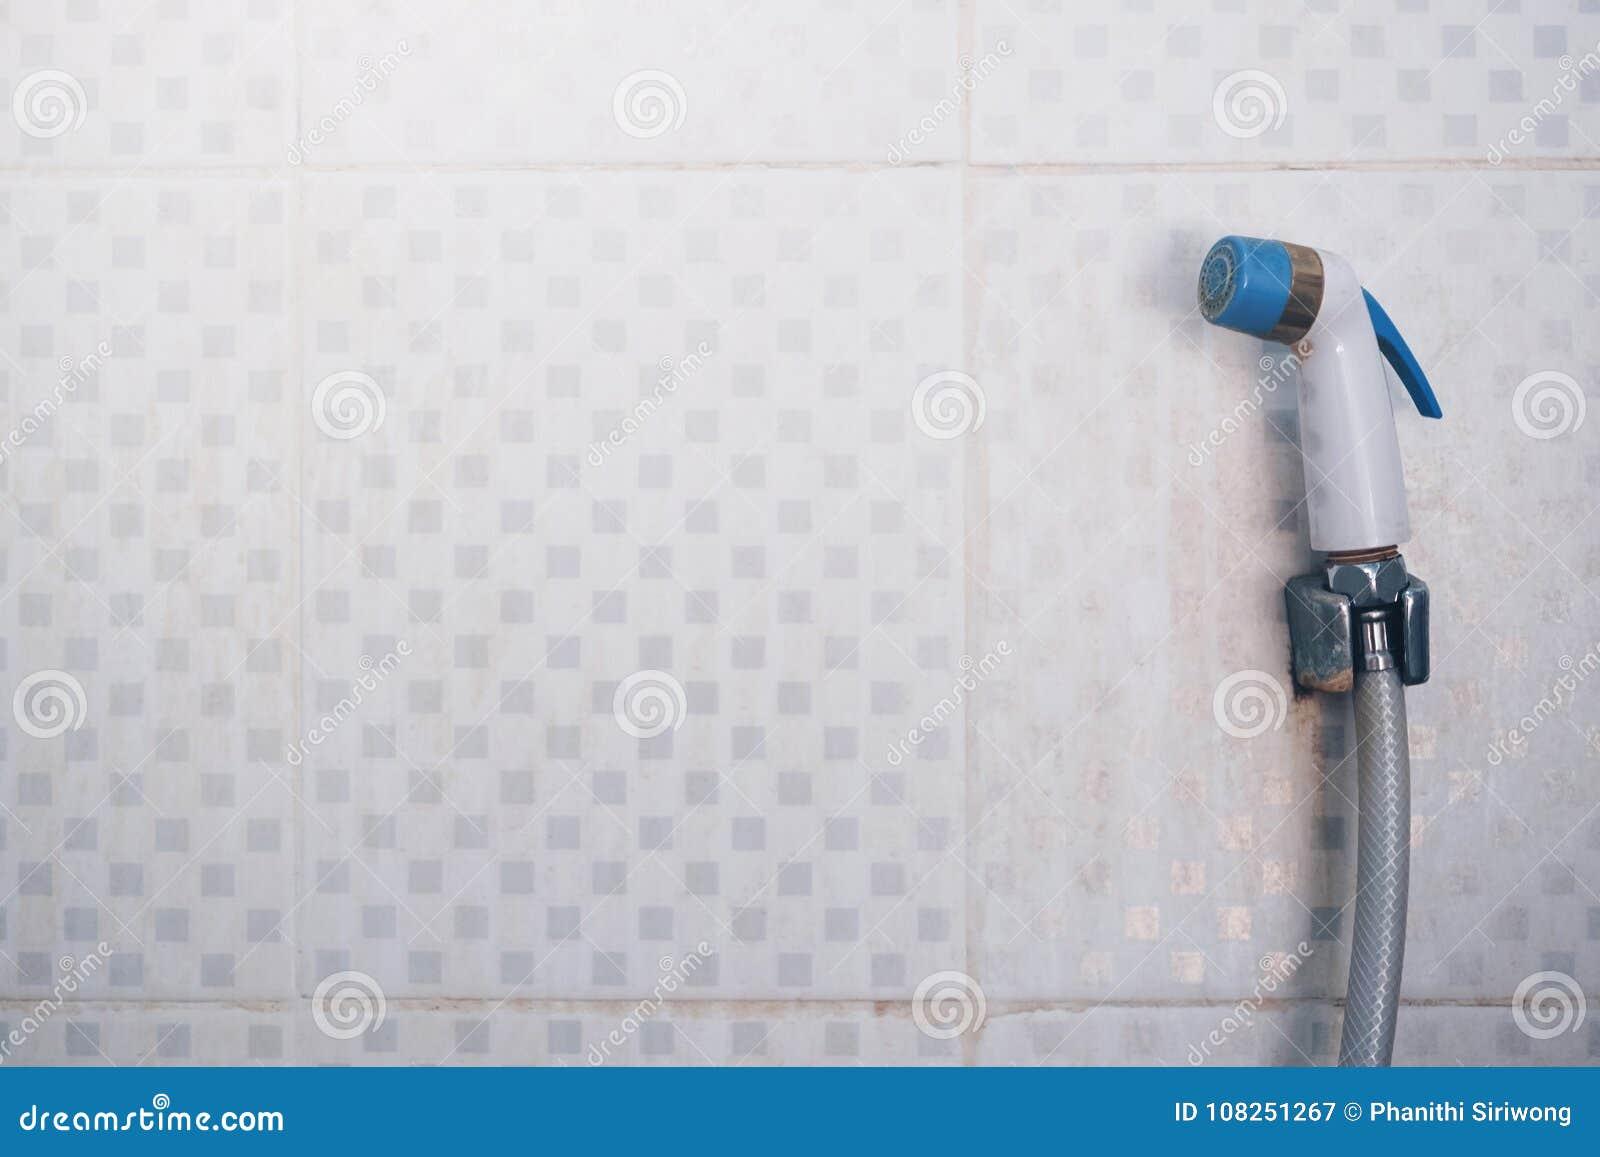 Bathroom Interior And Bidet Shower Or Bidet Spray Stock Image